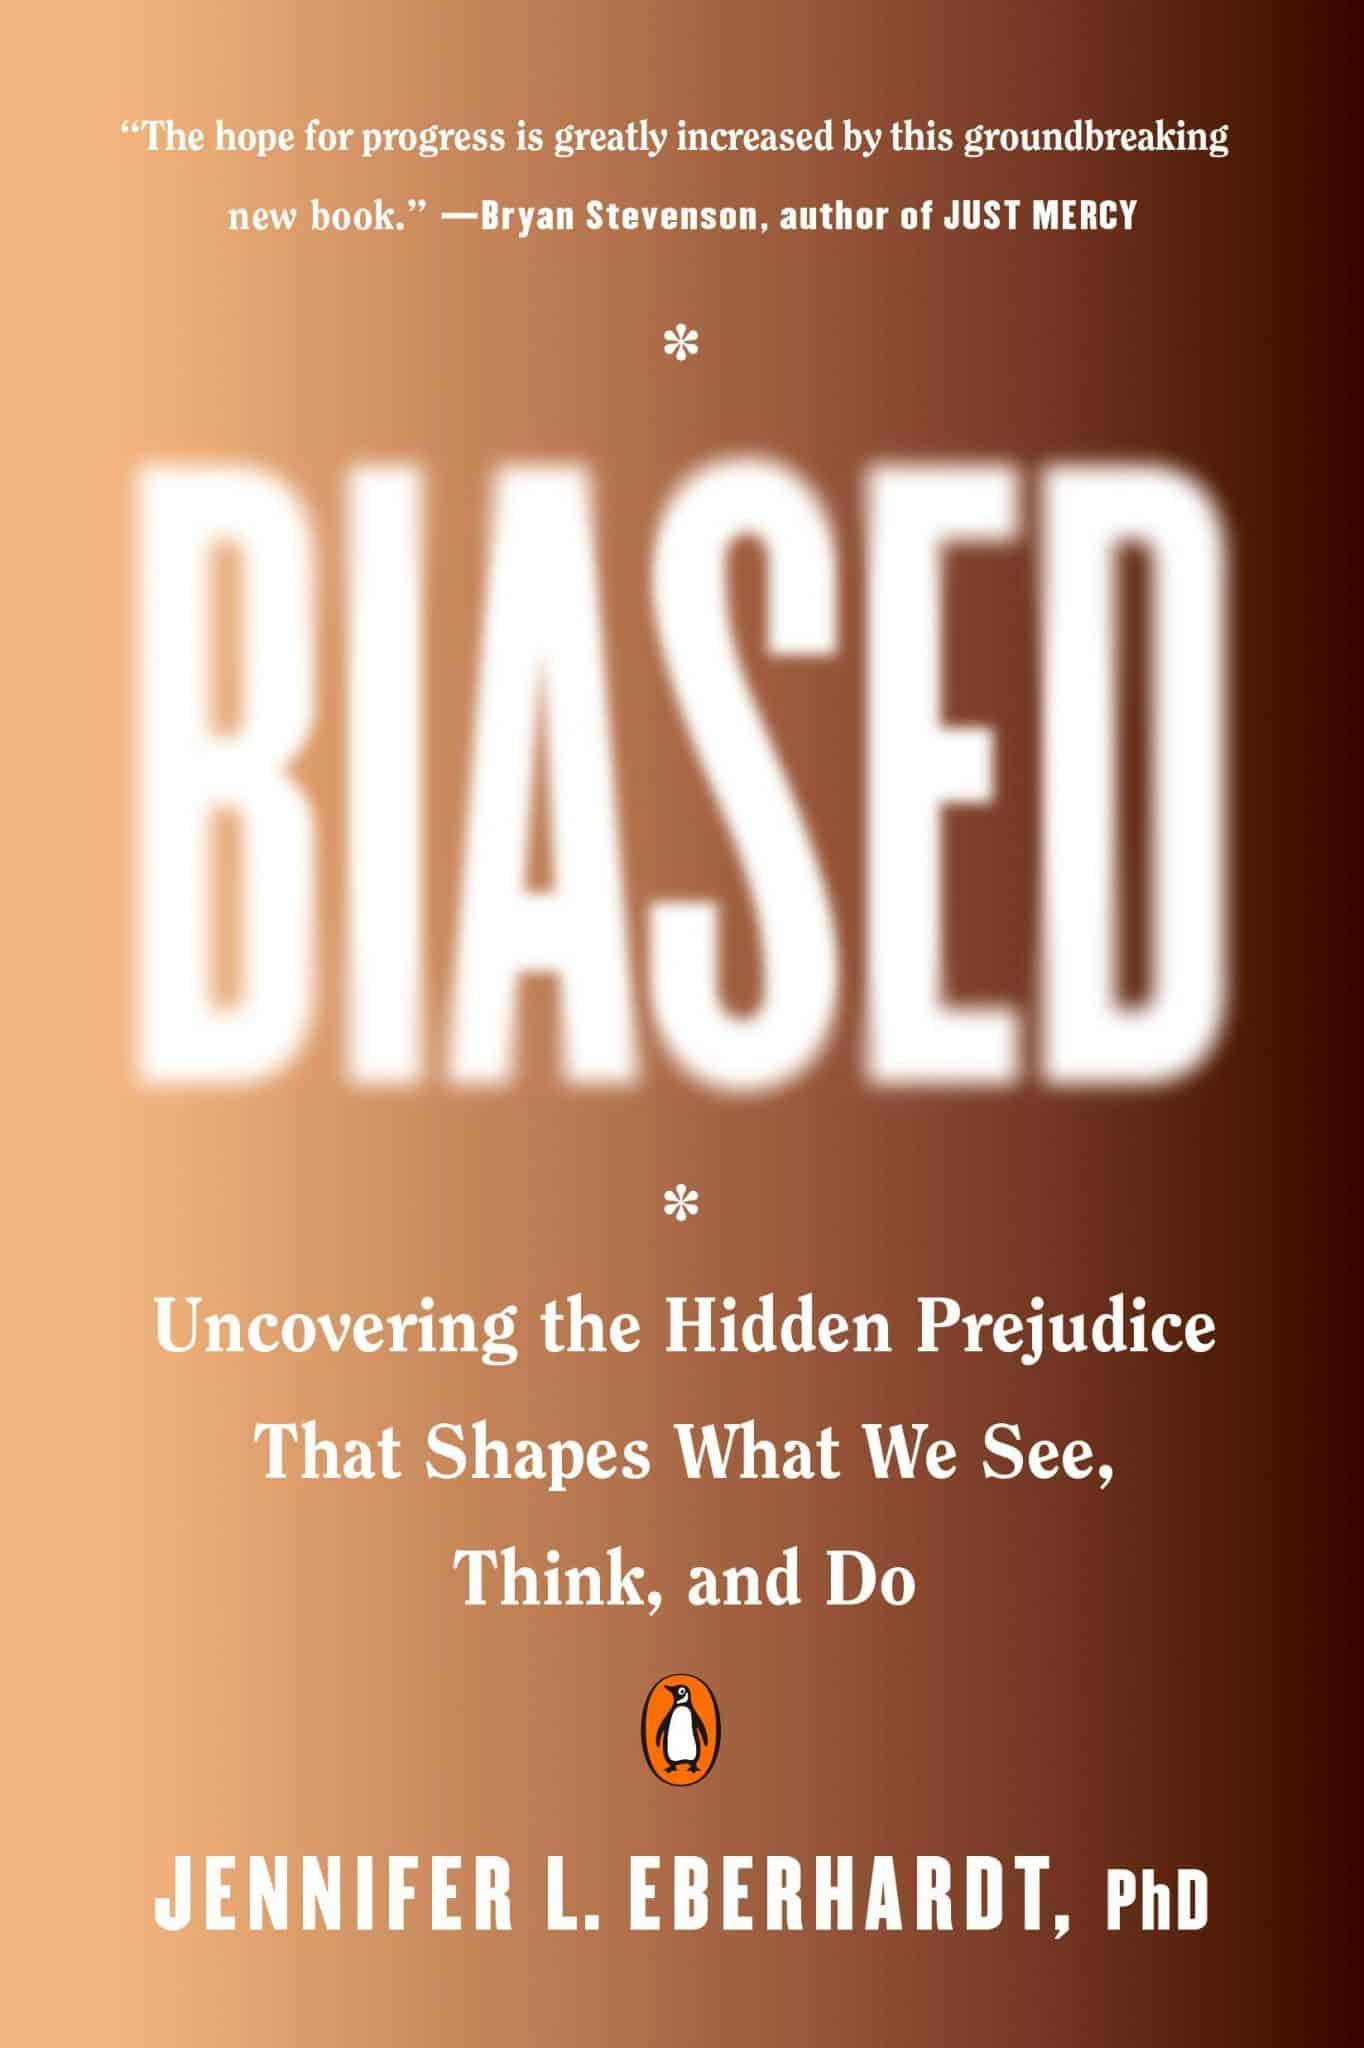 biased book